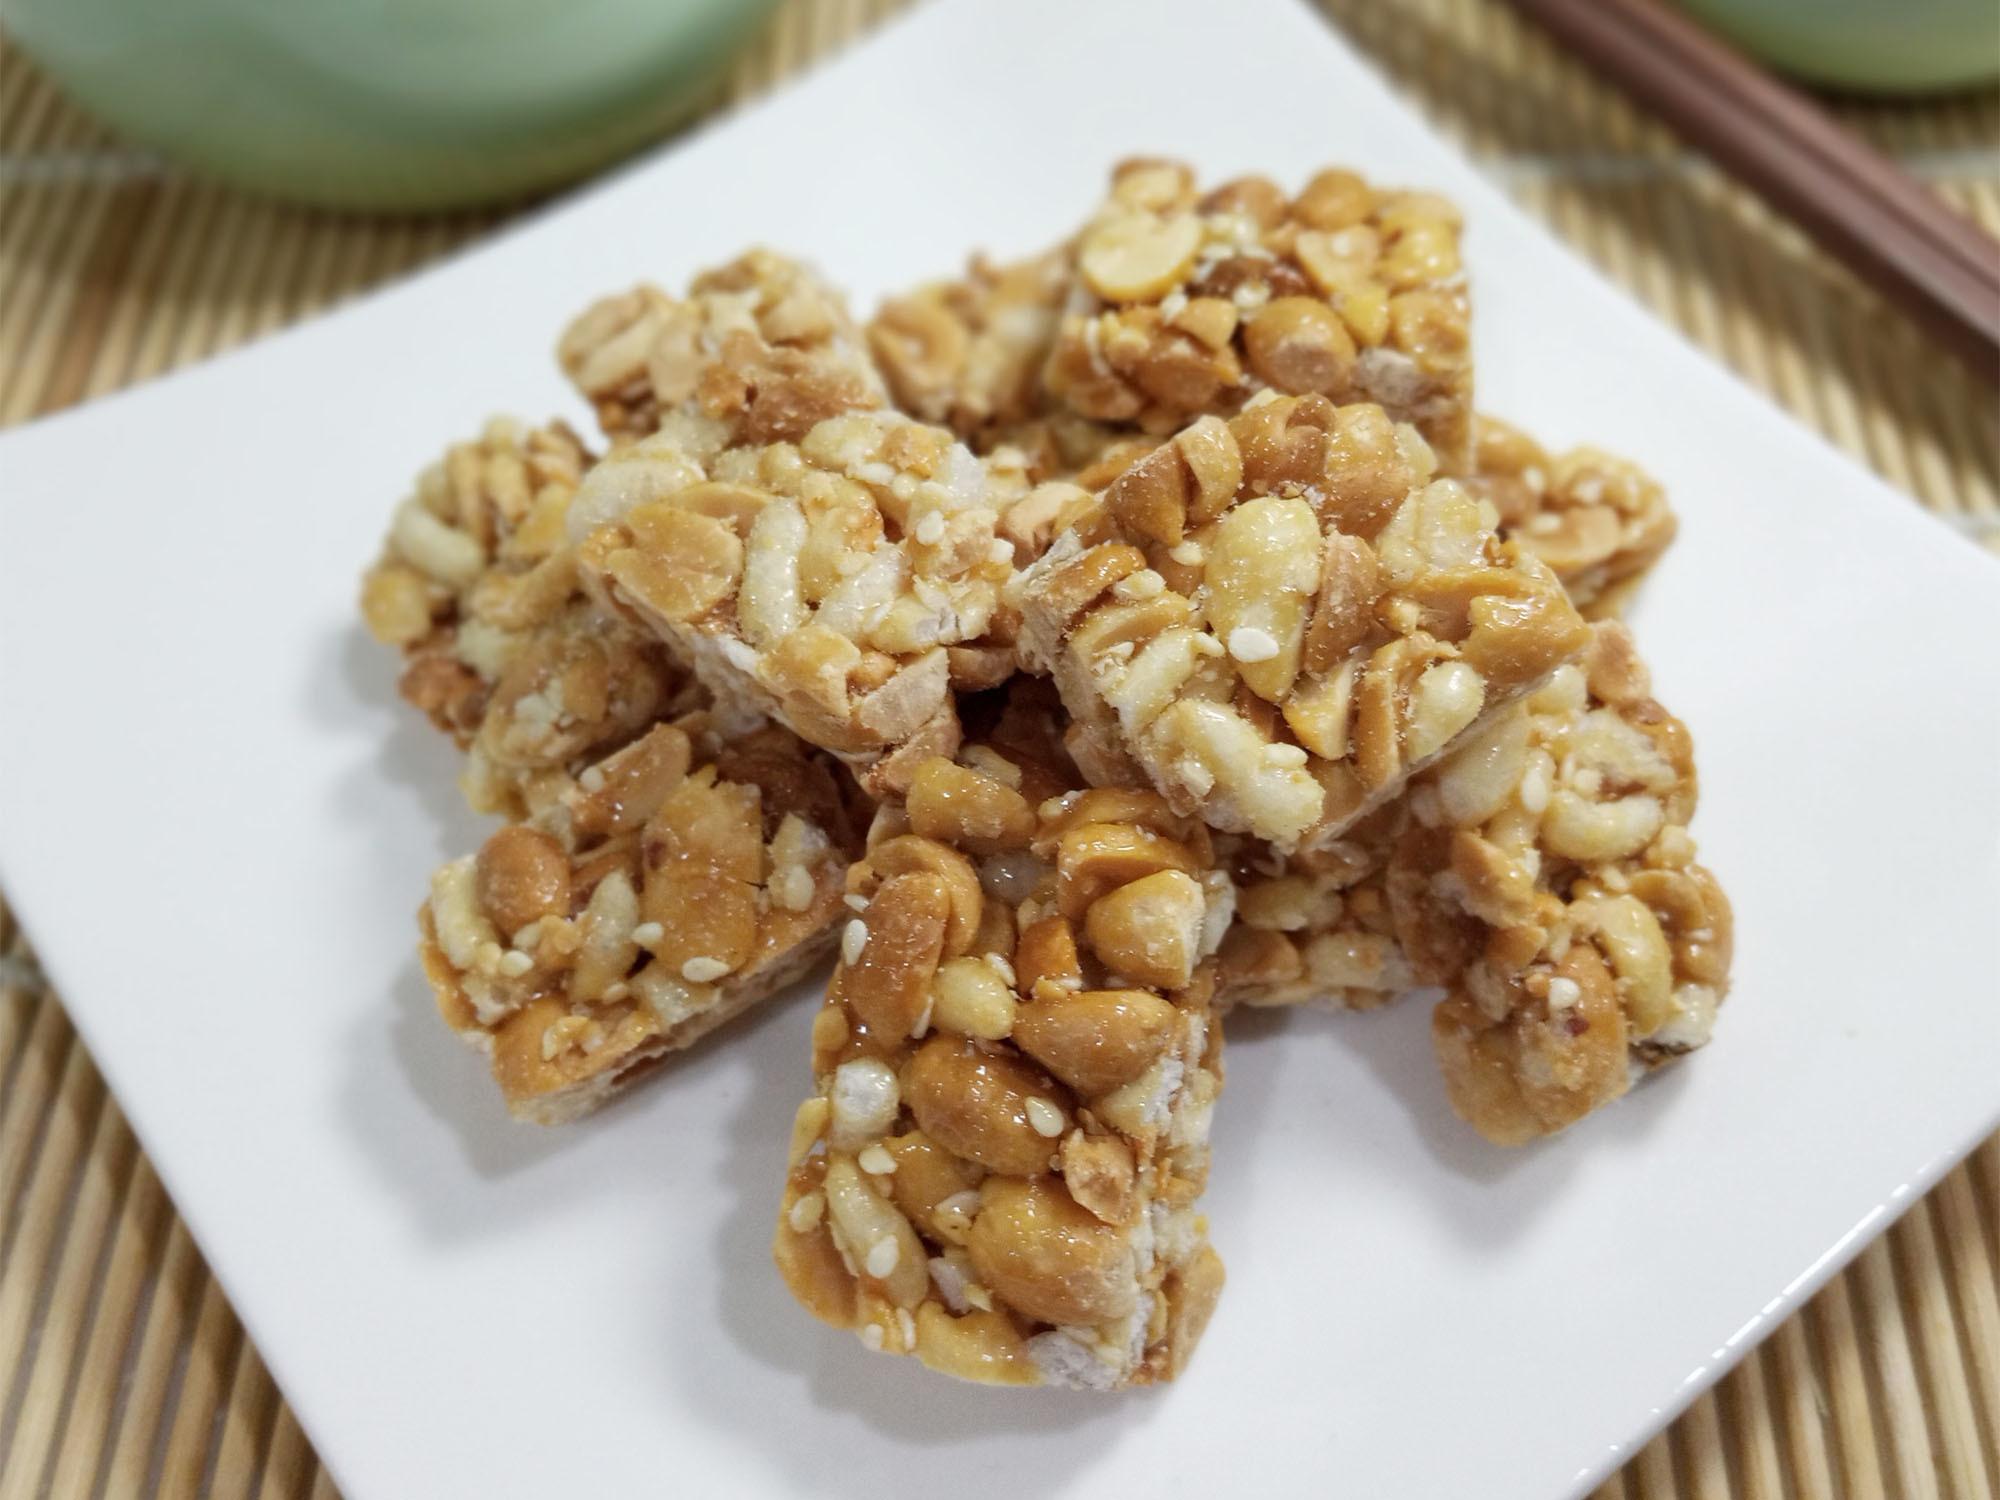 peanut candy1 -2000x1500.jpg